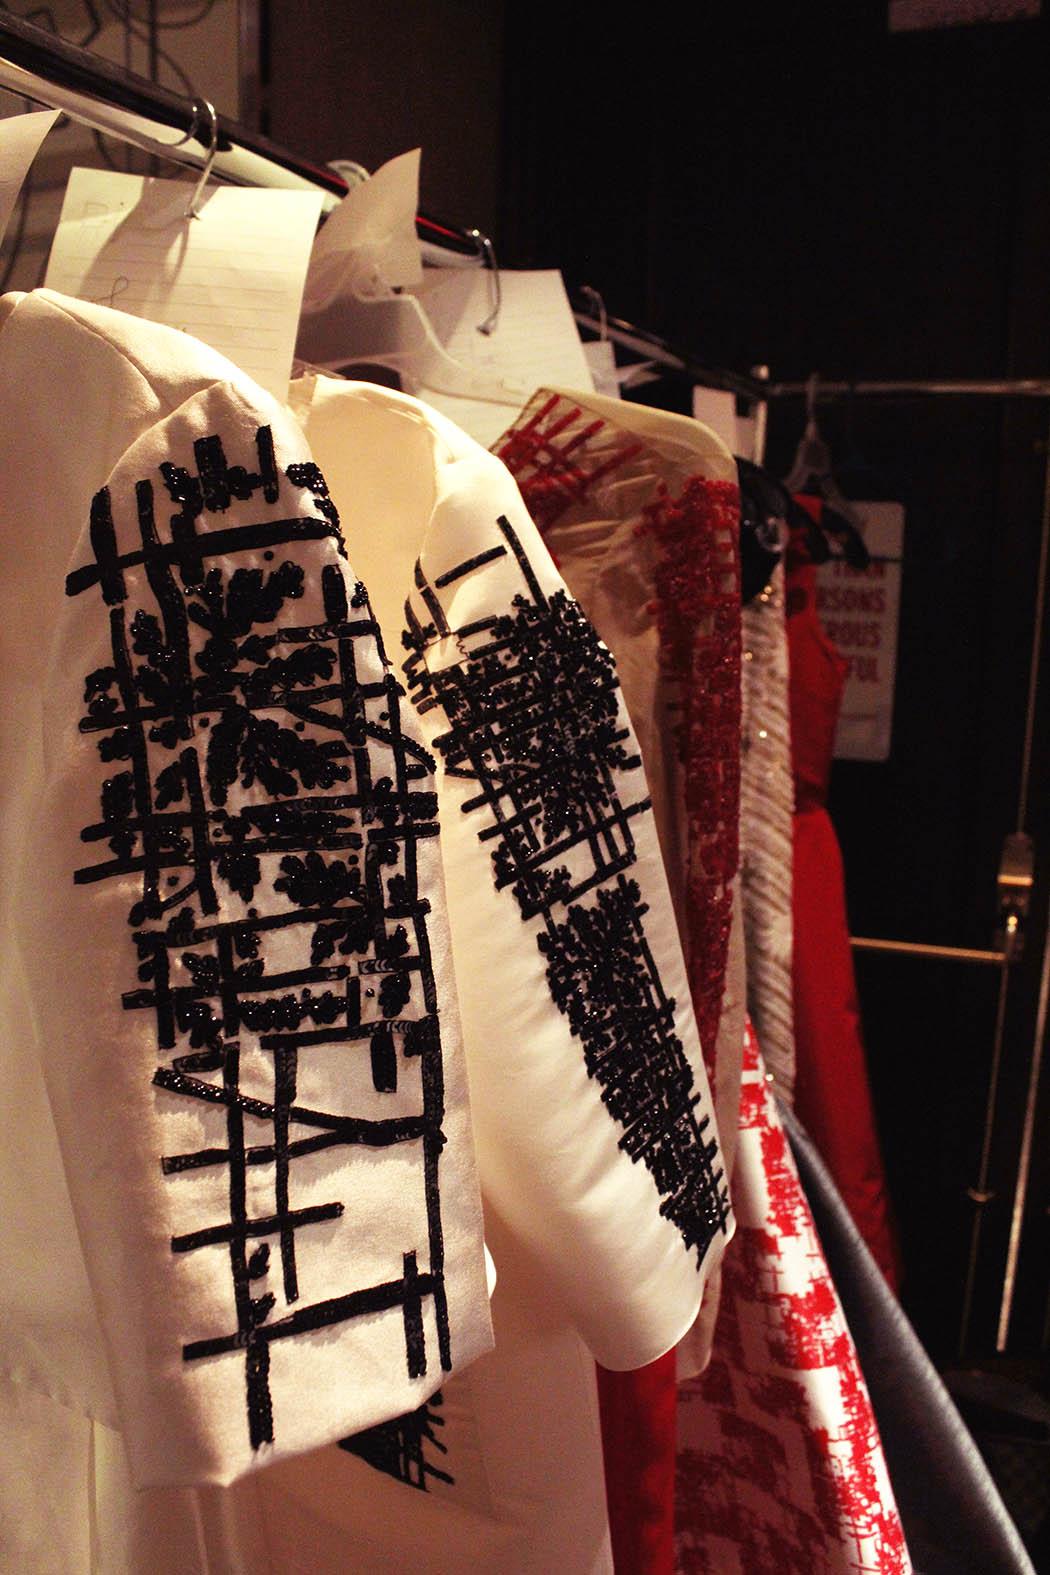 michael depaulo at the carlton hotel fall 2015 for new york fashion week